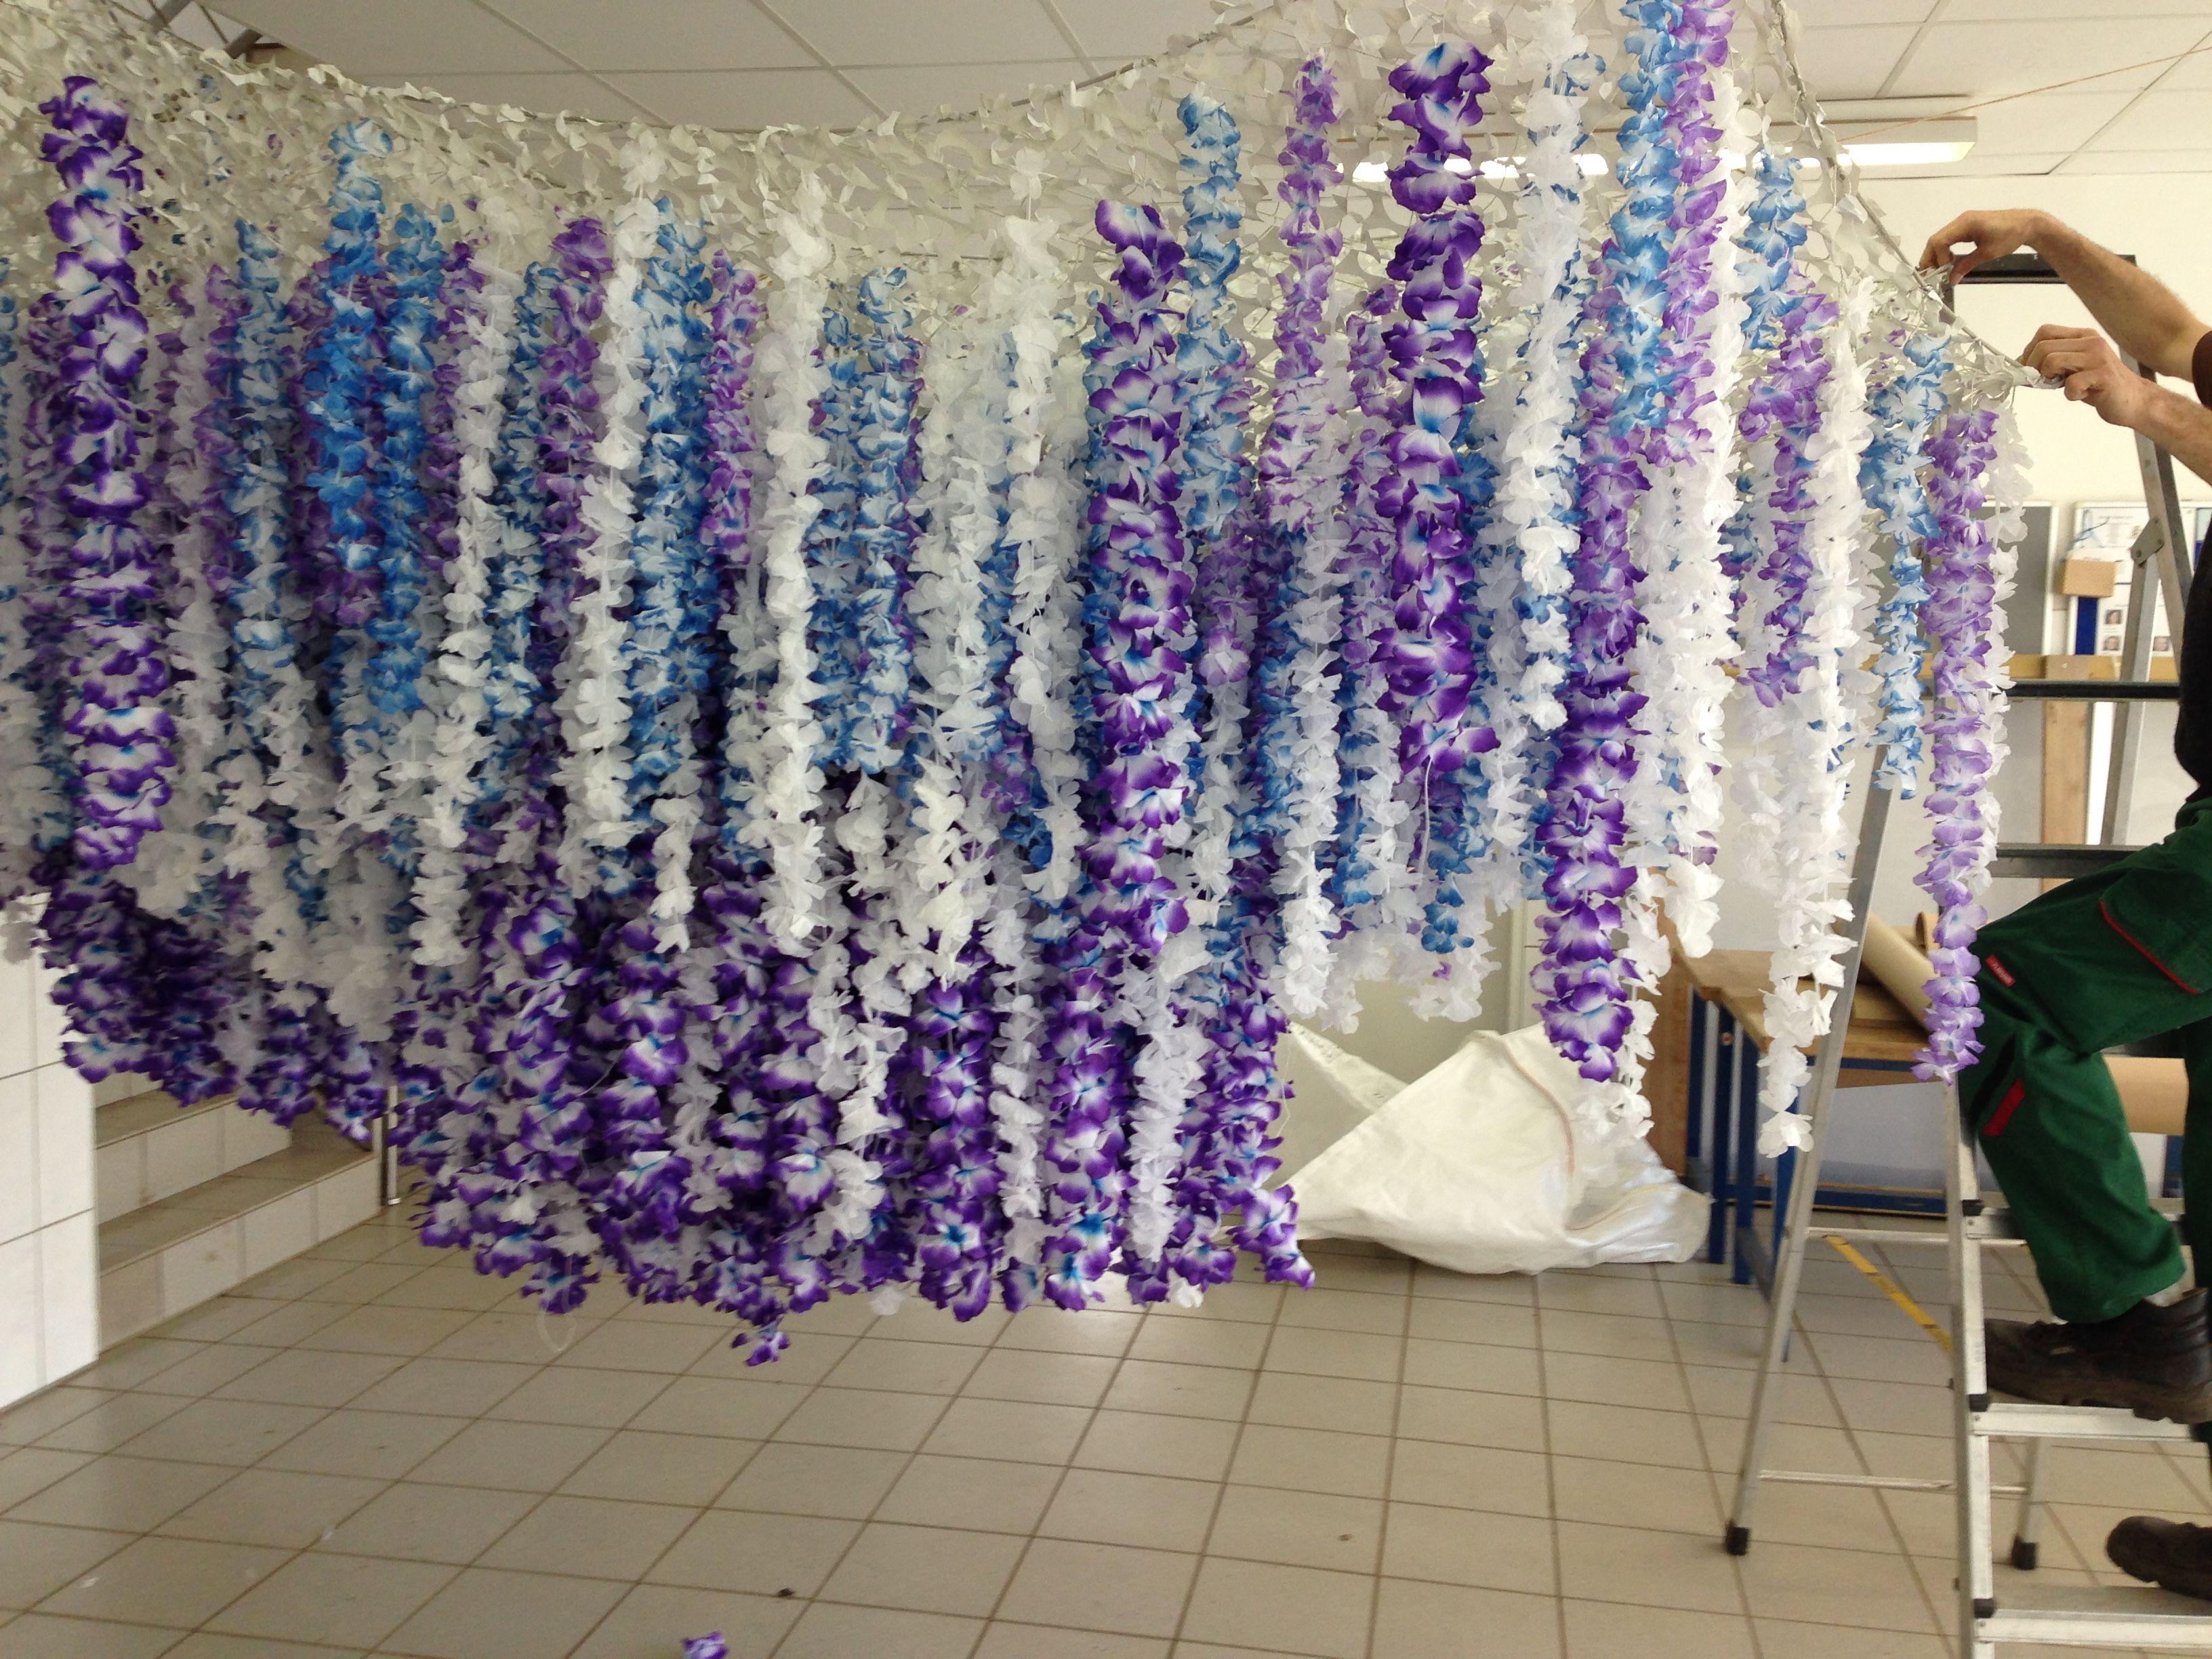 Superb Making of Magic Tree Dancefloor Kiesgrube Neuss Concept and realization by heilight